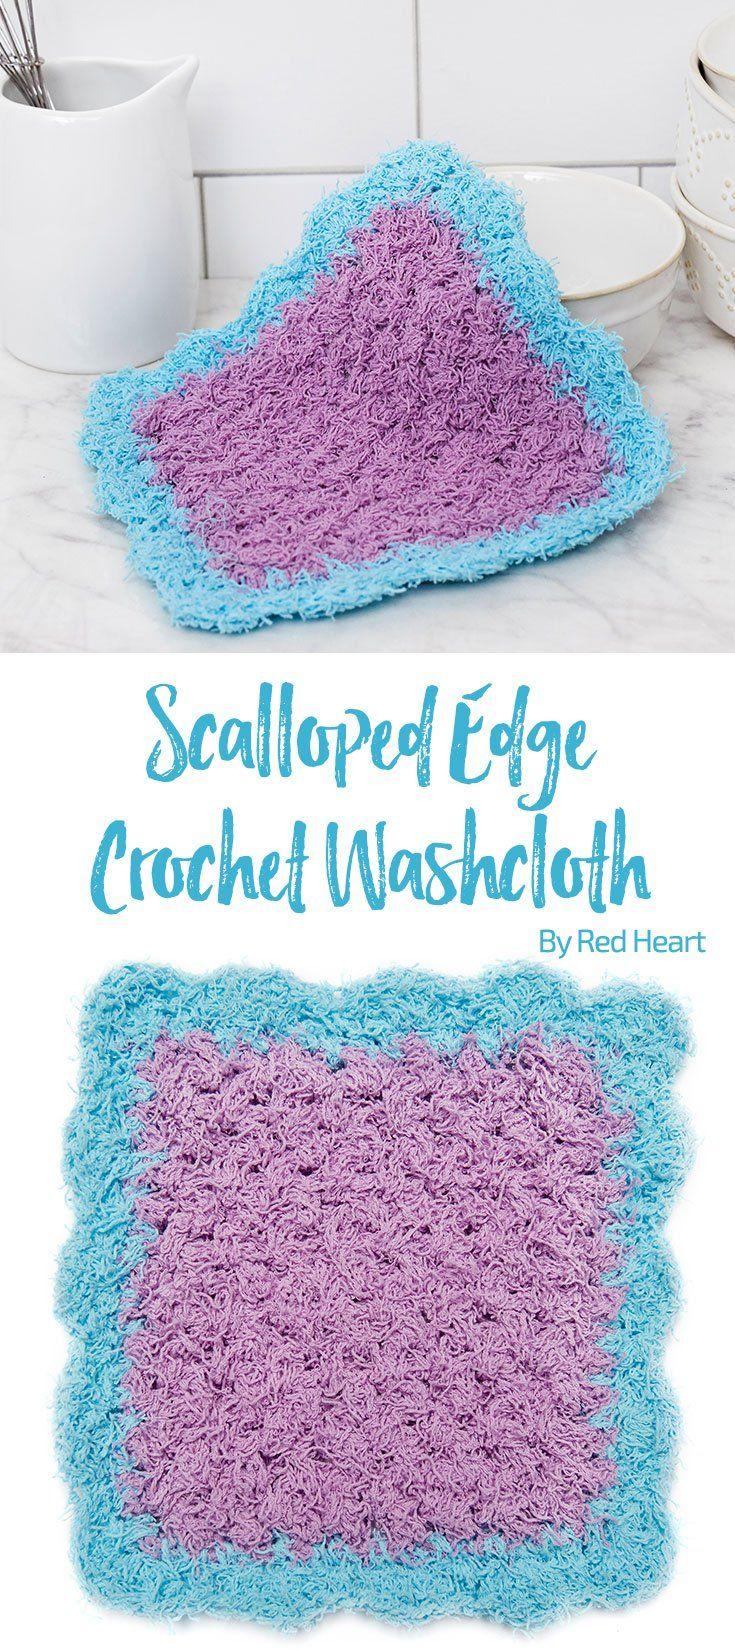 Scalloped edge crochet washcloth free crochet pattern in scrubby scalloped edge crochet washcloth free crochet pattern in scrubby cotton yarn bankloansurffo Images